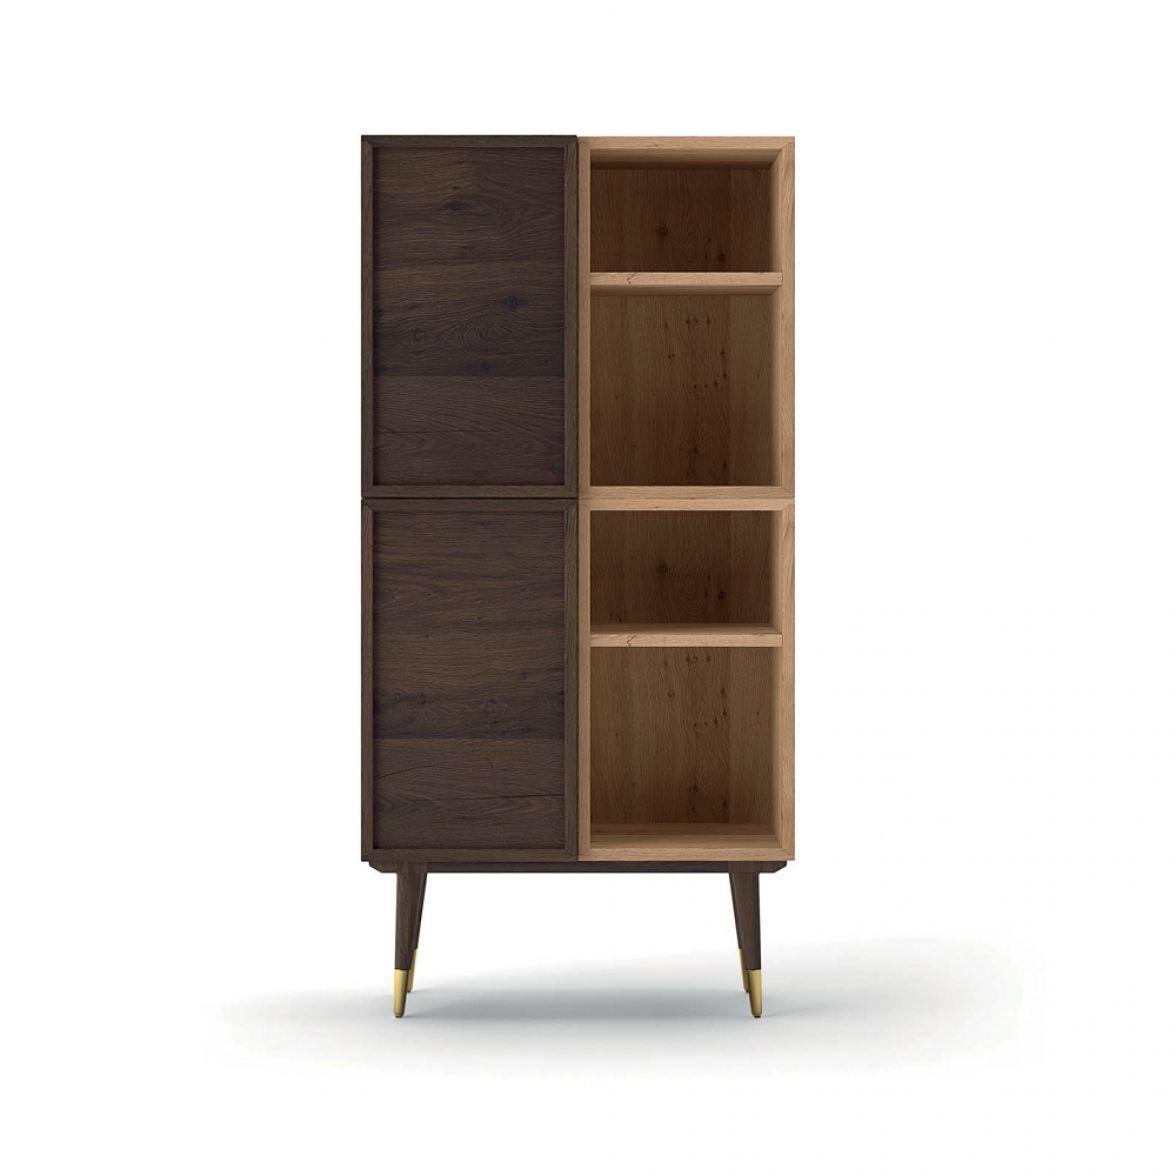 Coco bookcase фото цена